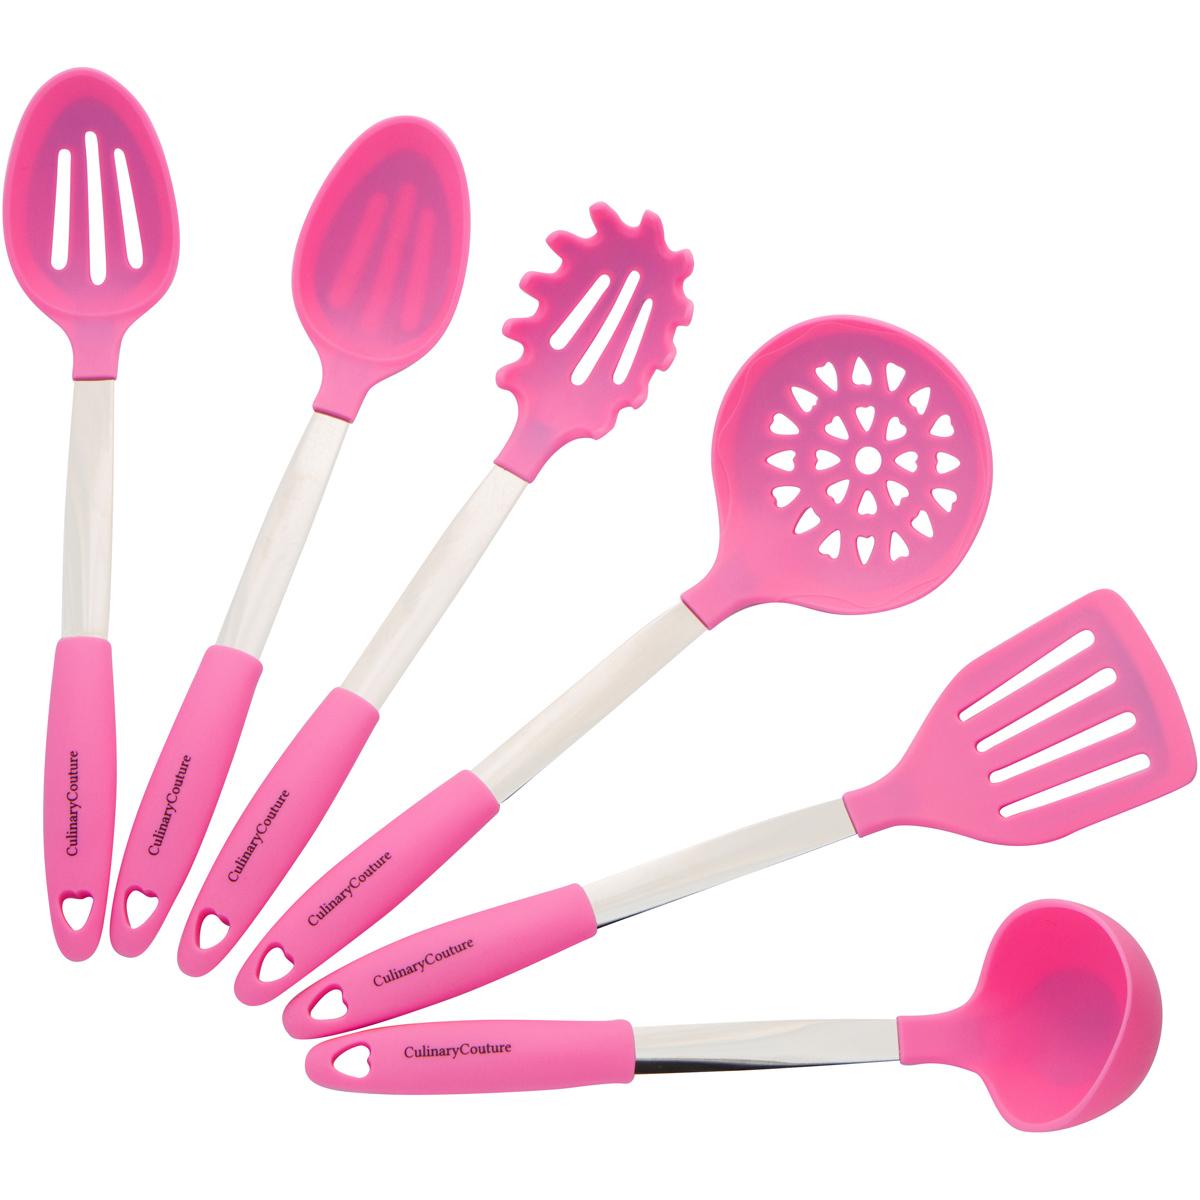 Pink Silicone Utensils